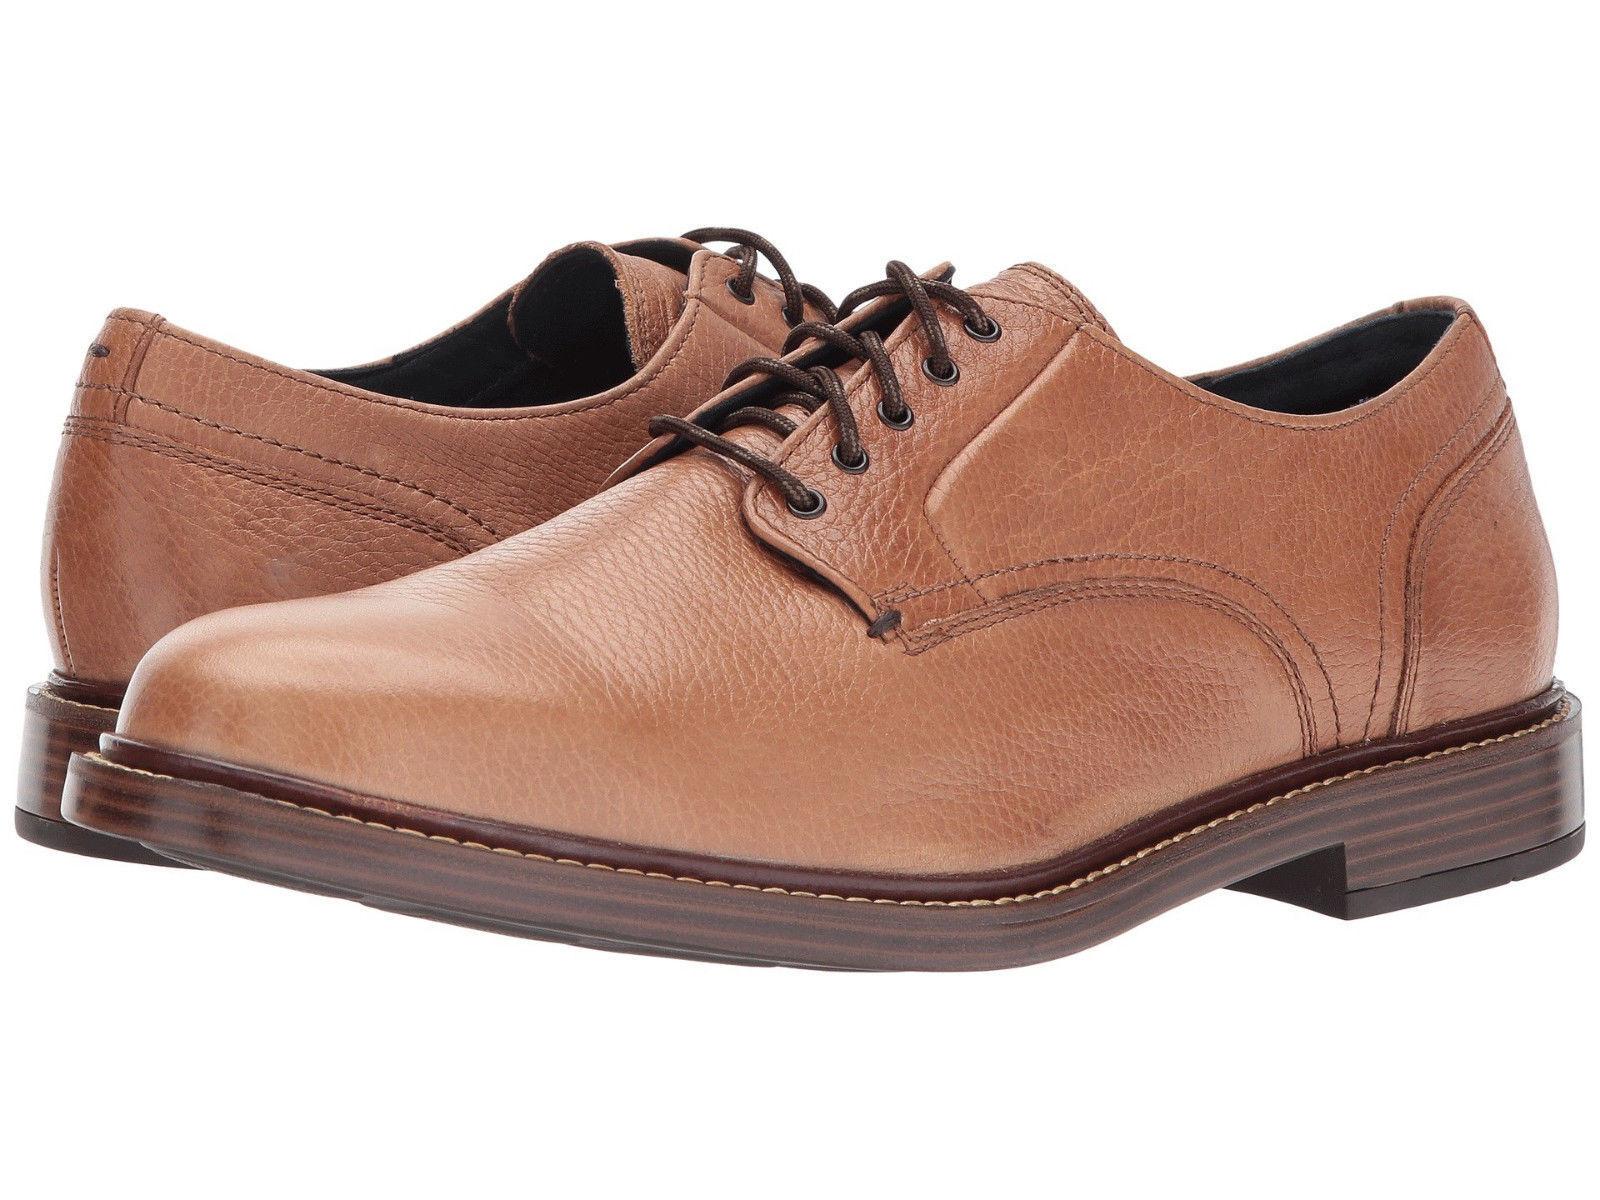 Cole Haan Men's Adams Grand Plain Toe US 10 M Tan Leather Oxfords